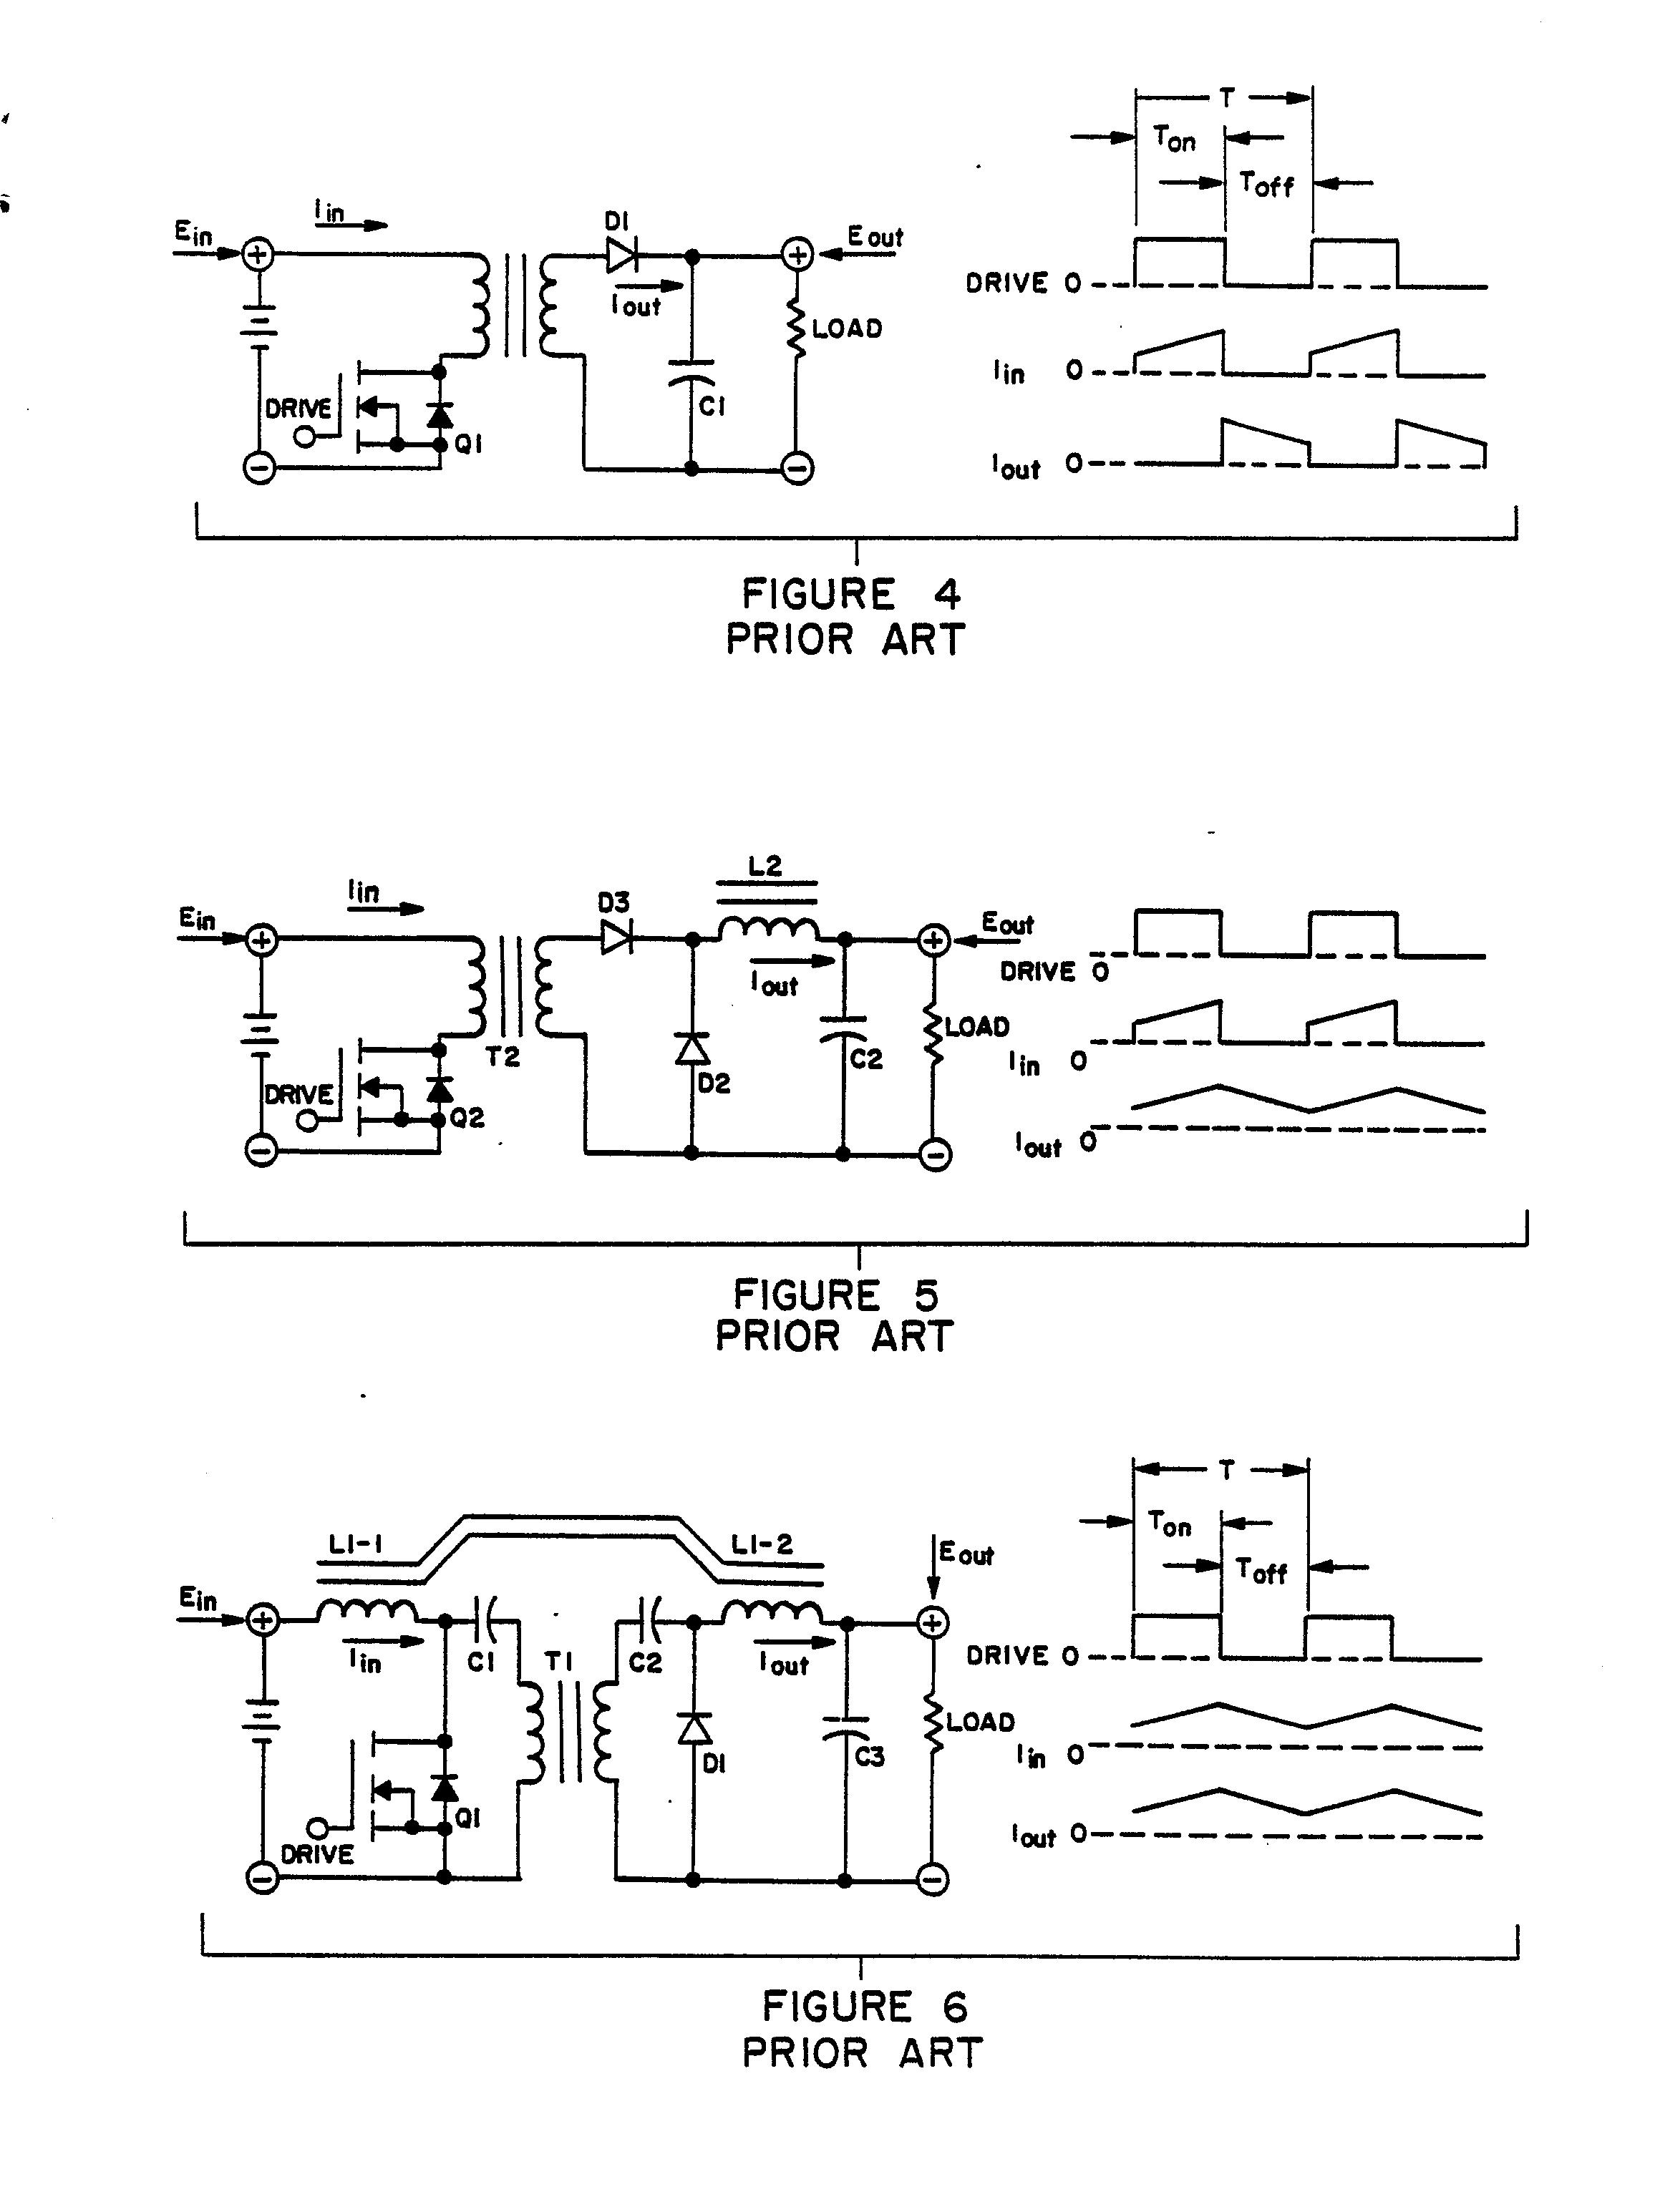 Positive Buck Converter With Wide Input Range Circuit Diagram